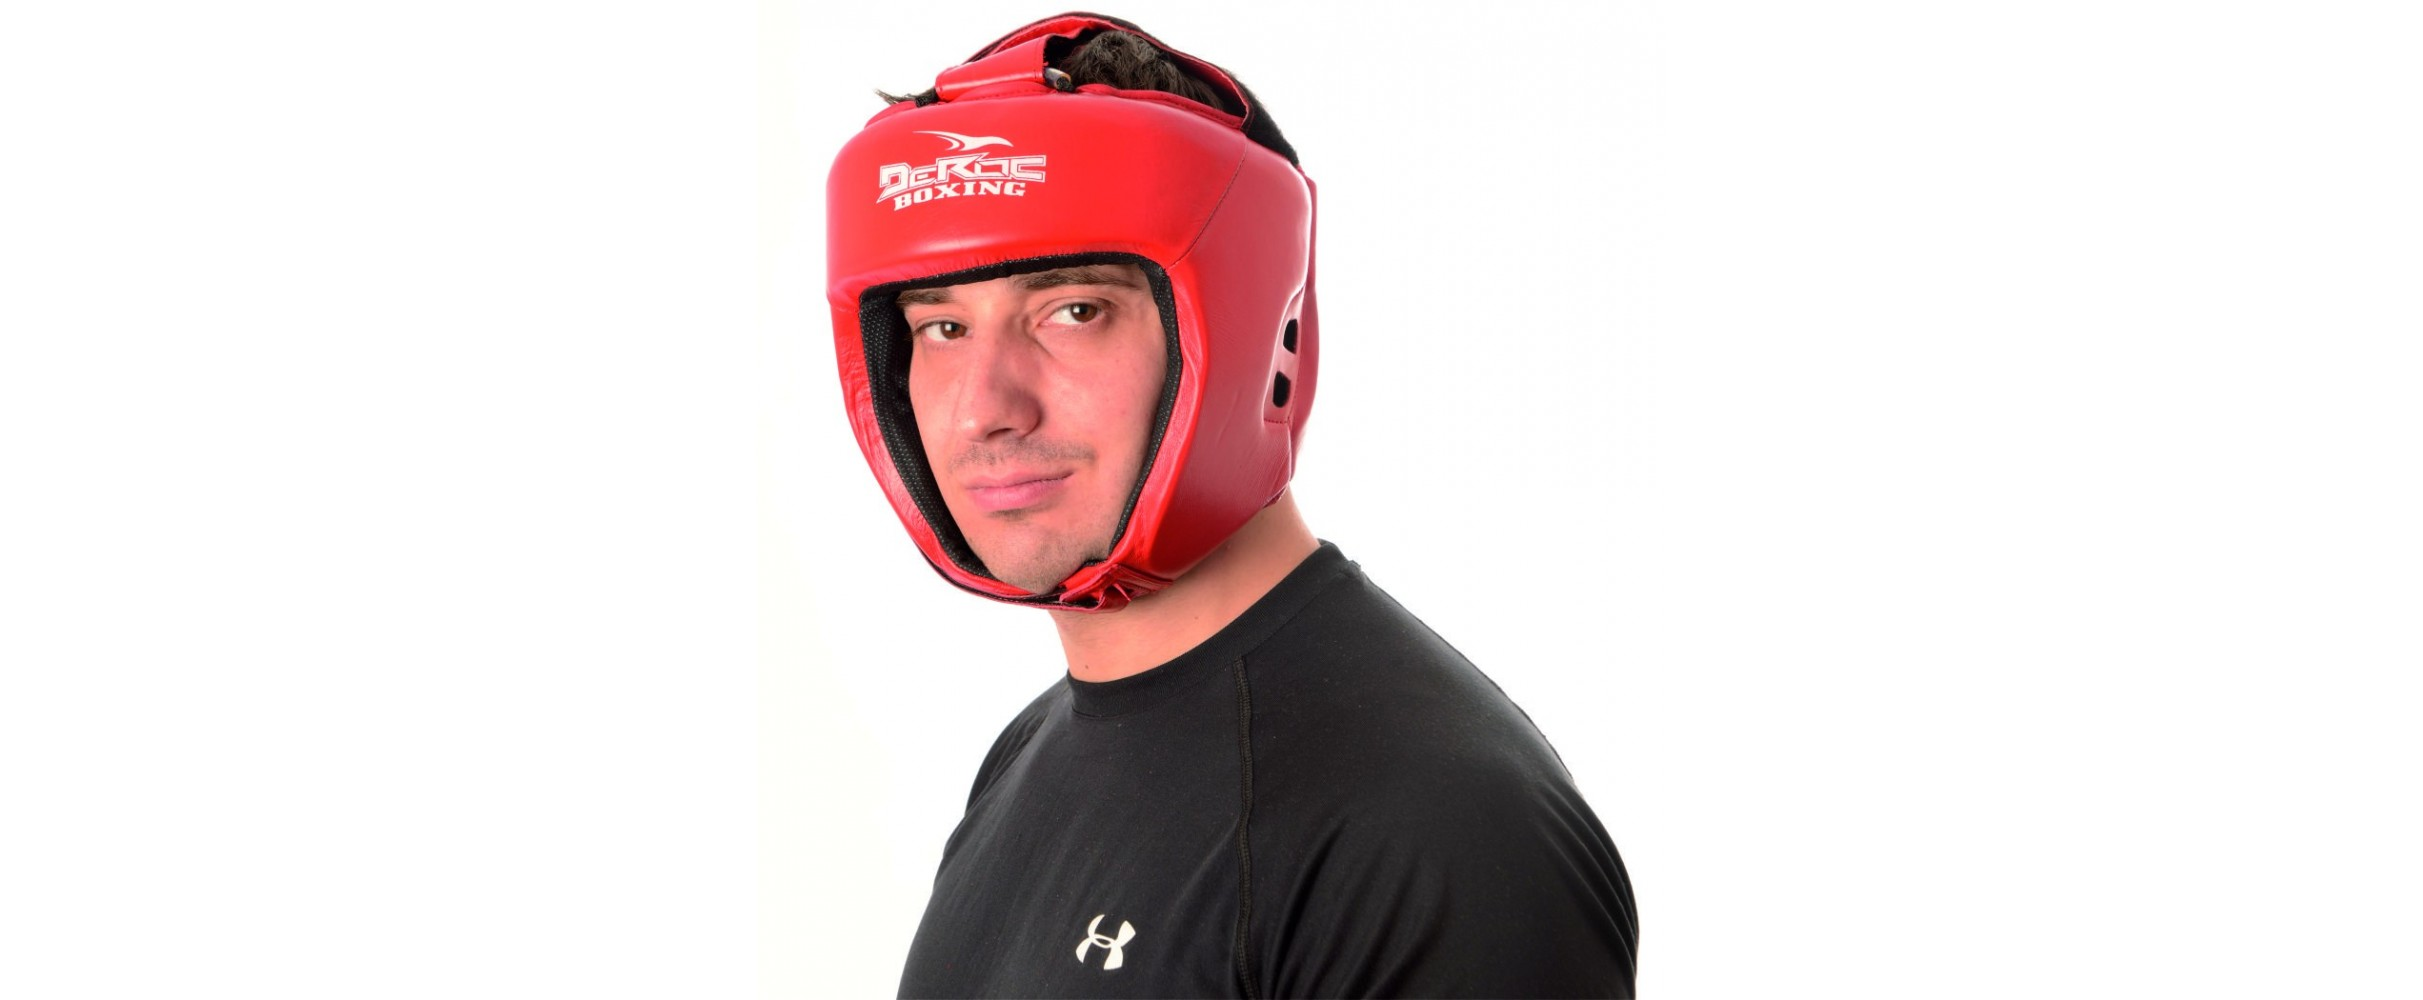 Boxing Head Guard Aiba style